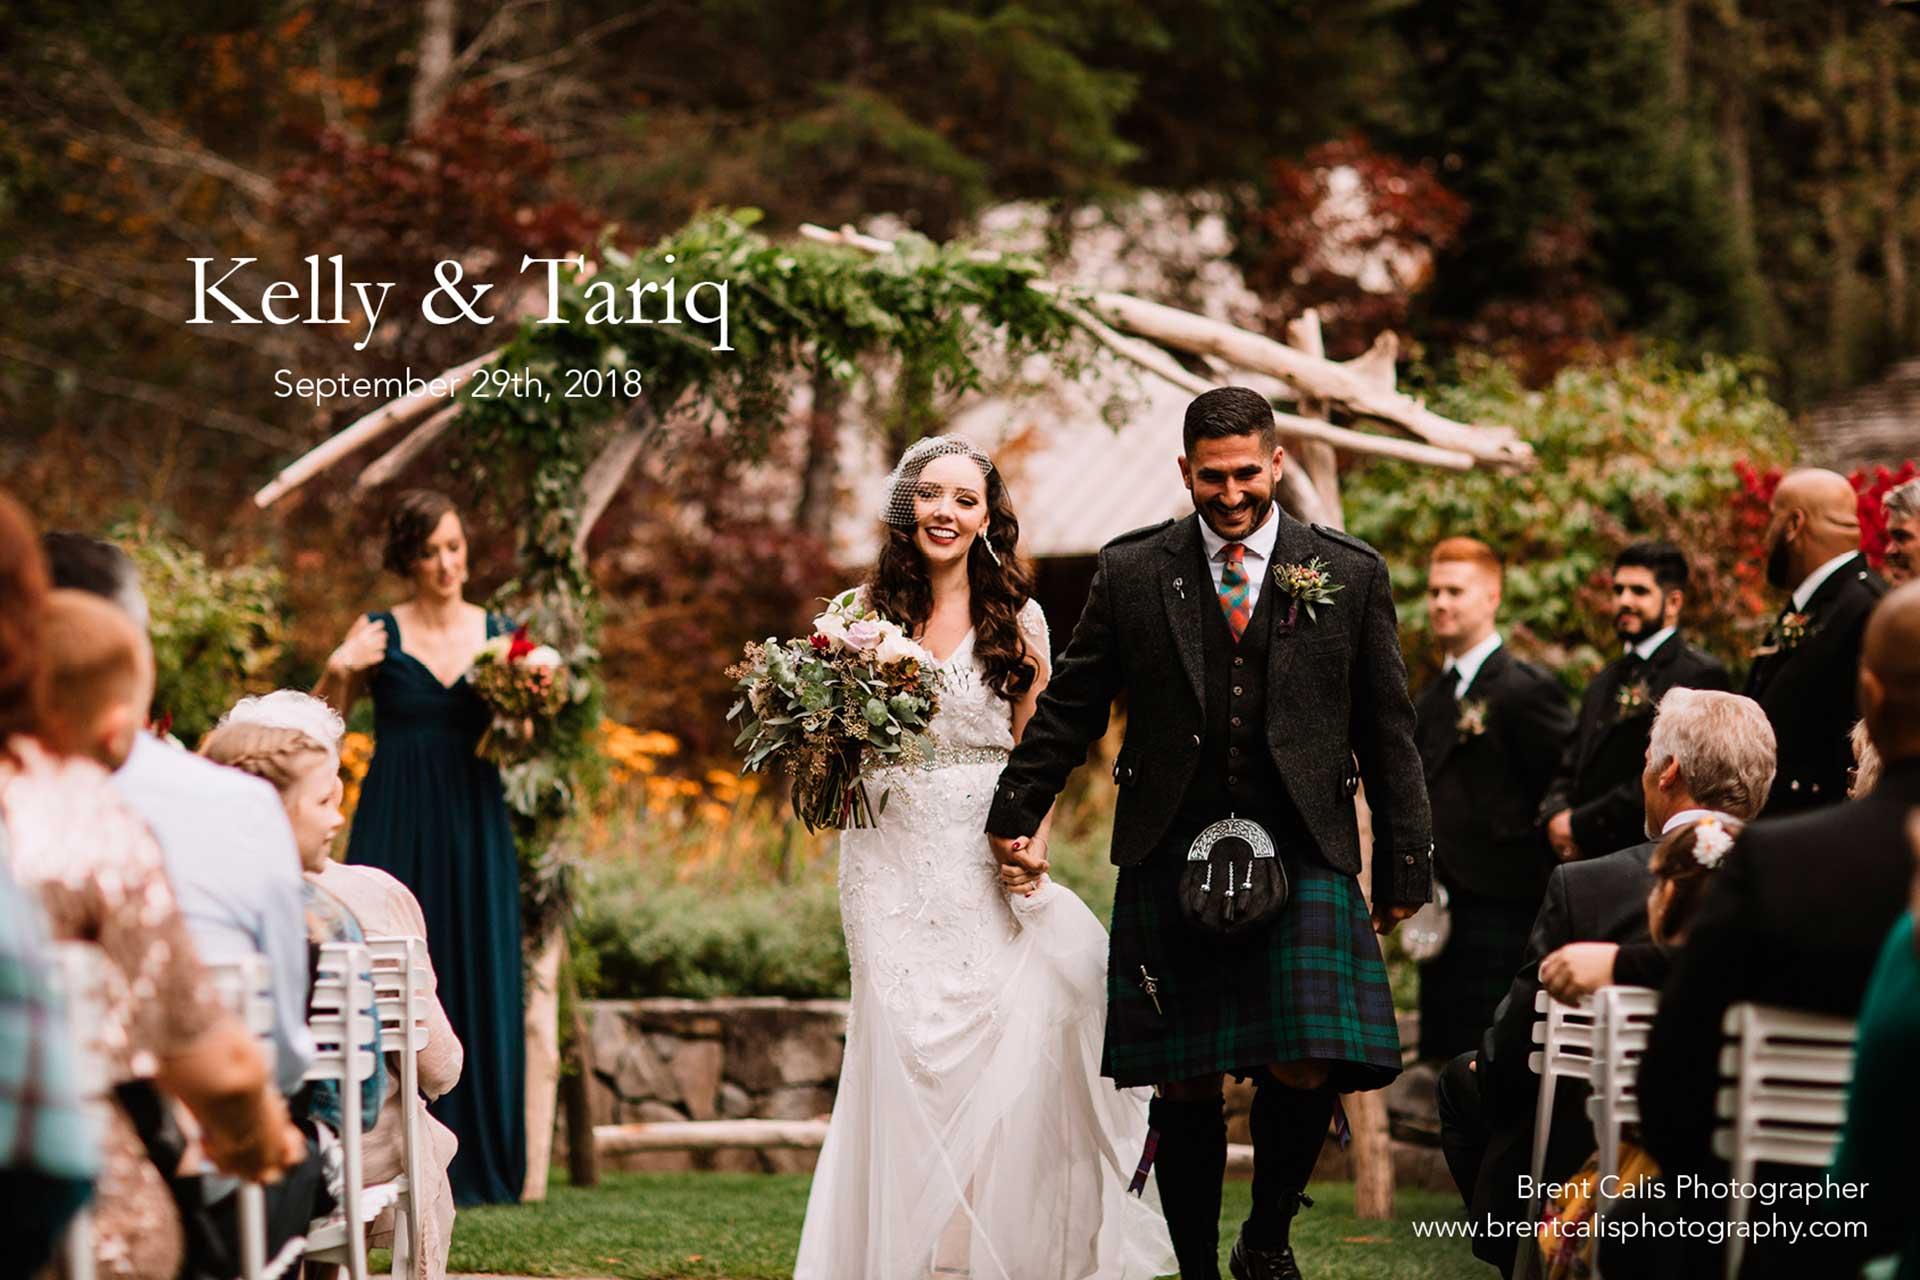 Kelly and Tariq's Wedding